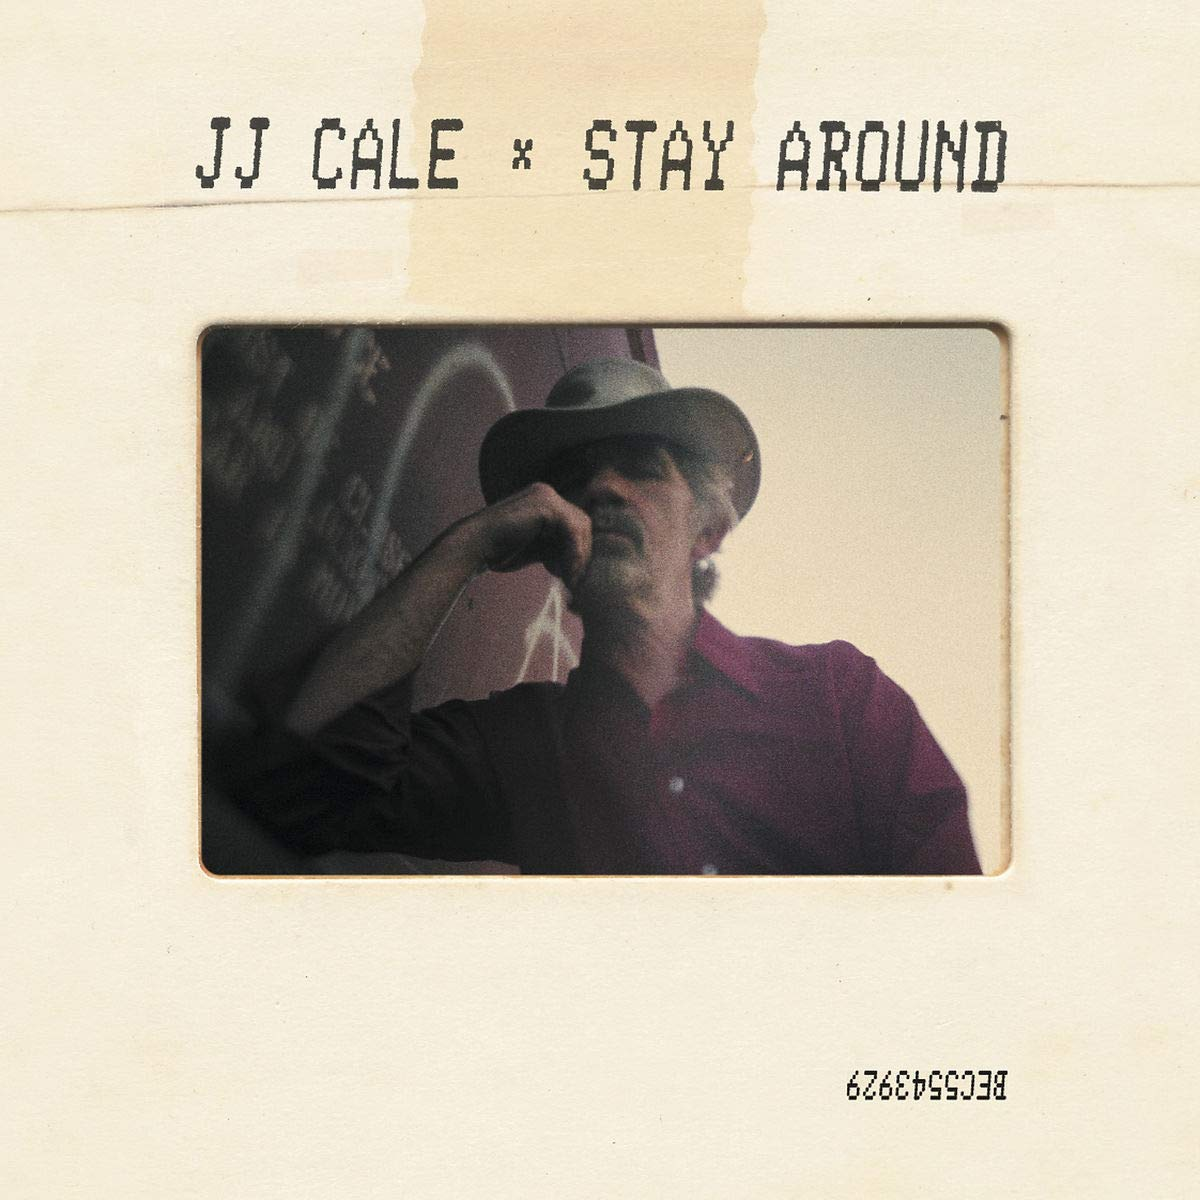 CD Shop - CALE J.J. STAY AROUND